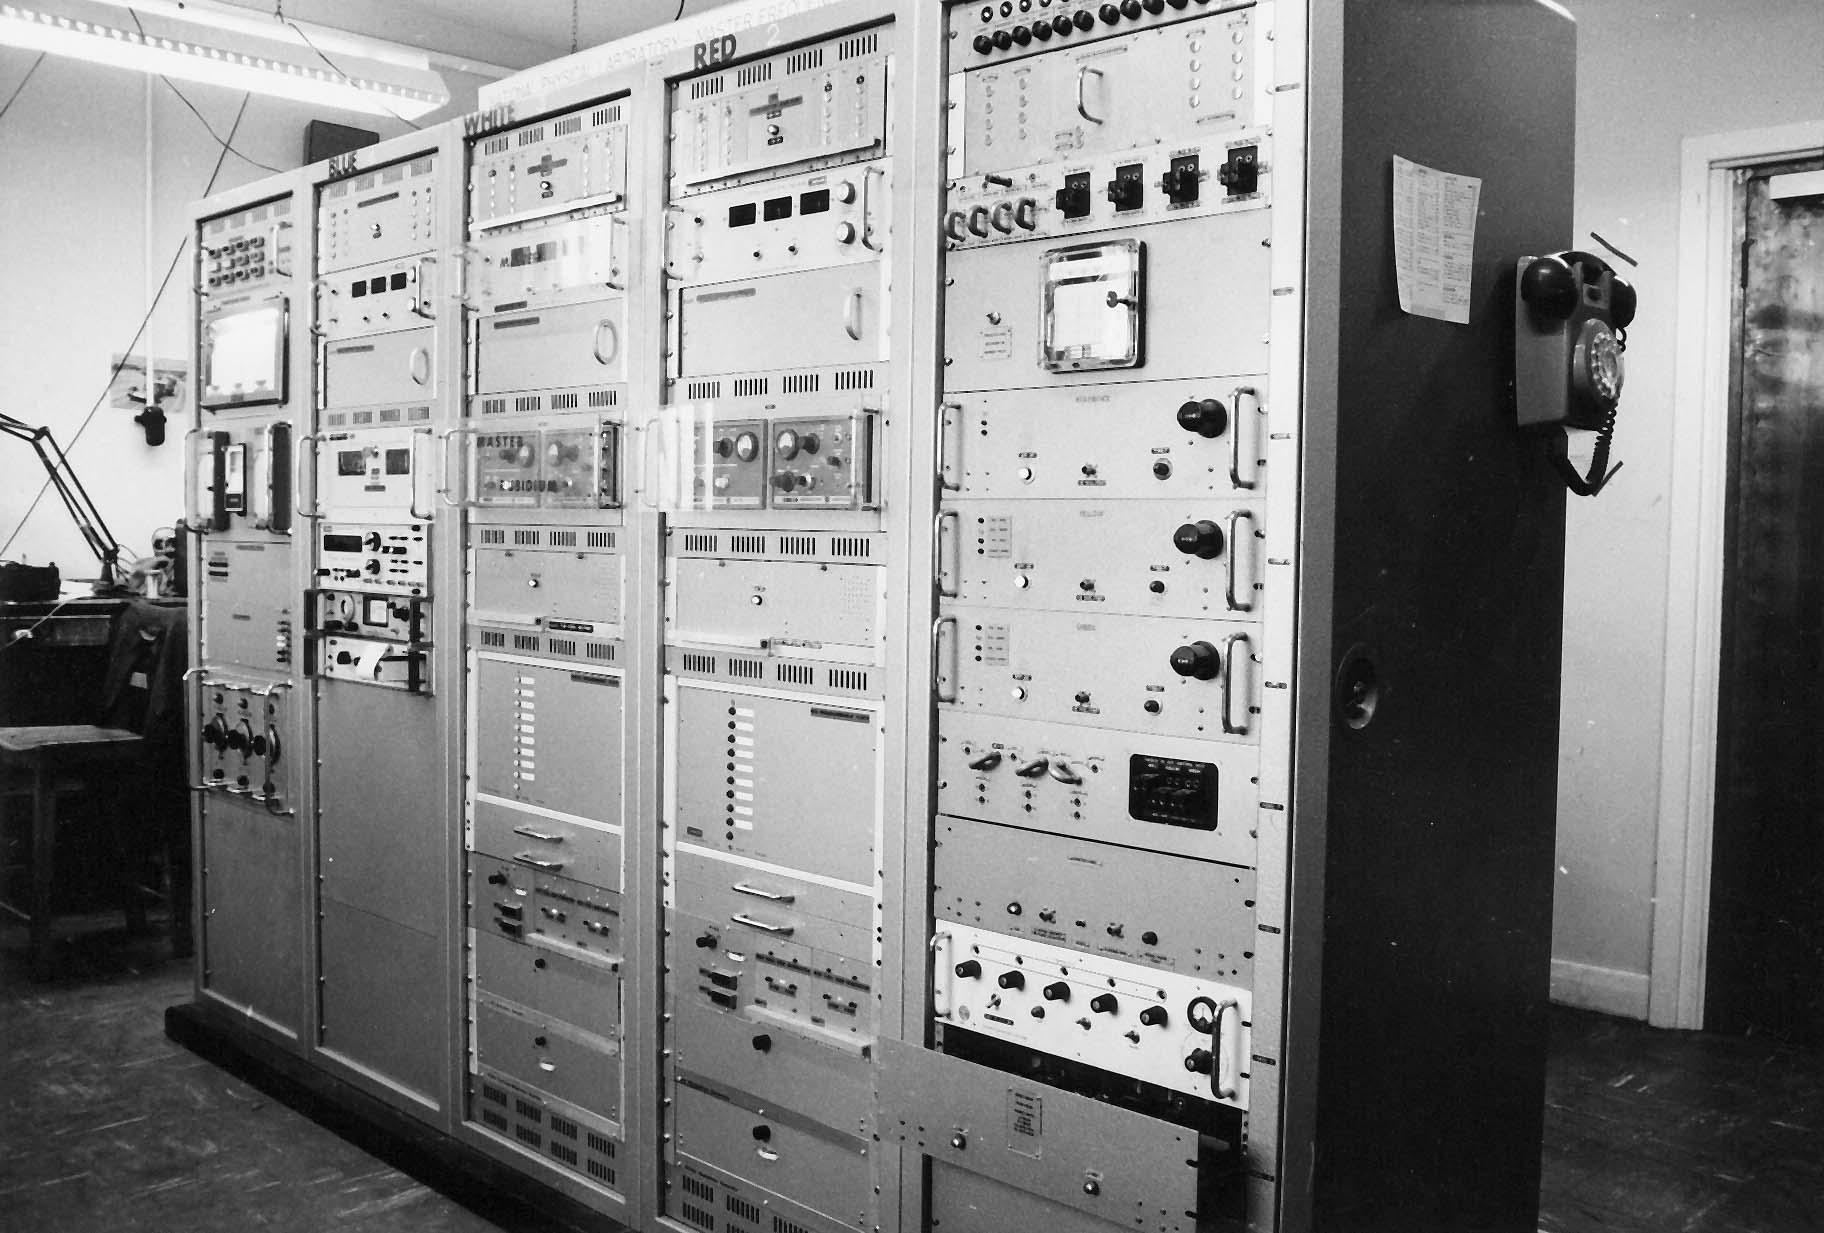 304 MSF Drive Equipment Early 1970s